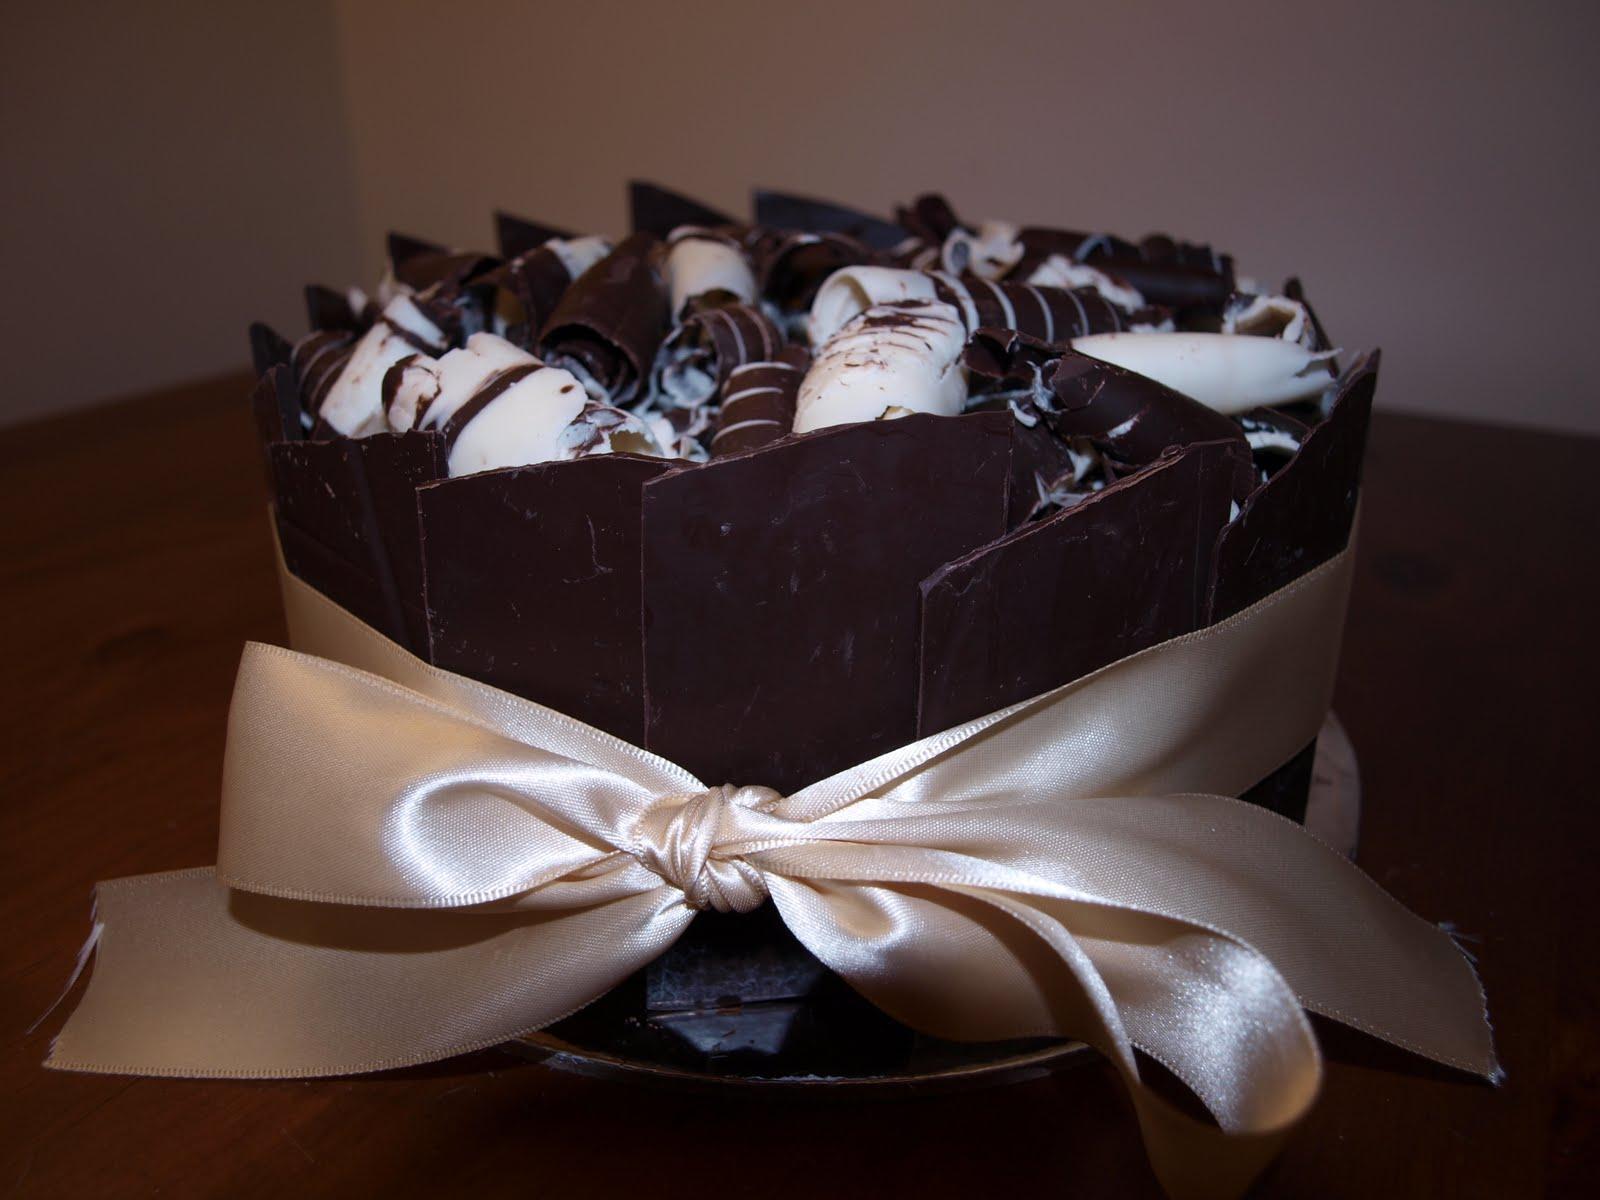 Takes the cake Chocolate fences